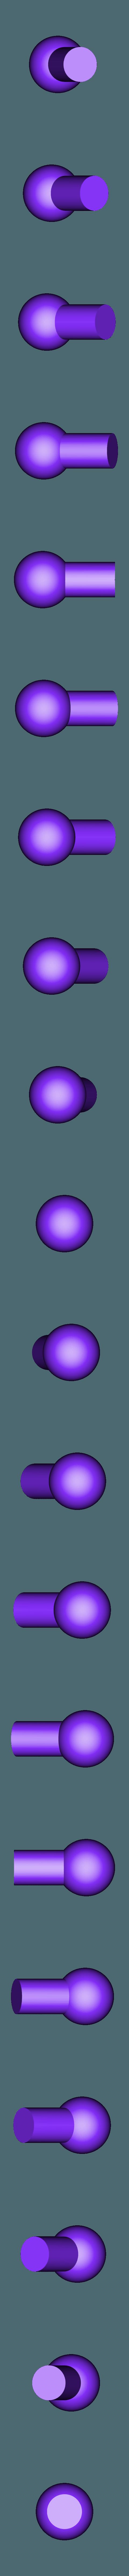 Ball Joint-Small_2X v2.STL Download STL file Grimlock • Model to 3D print, biglildesign